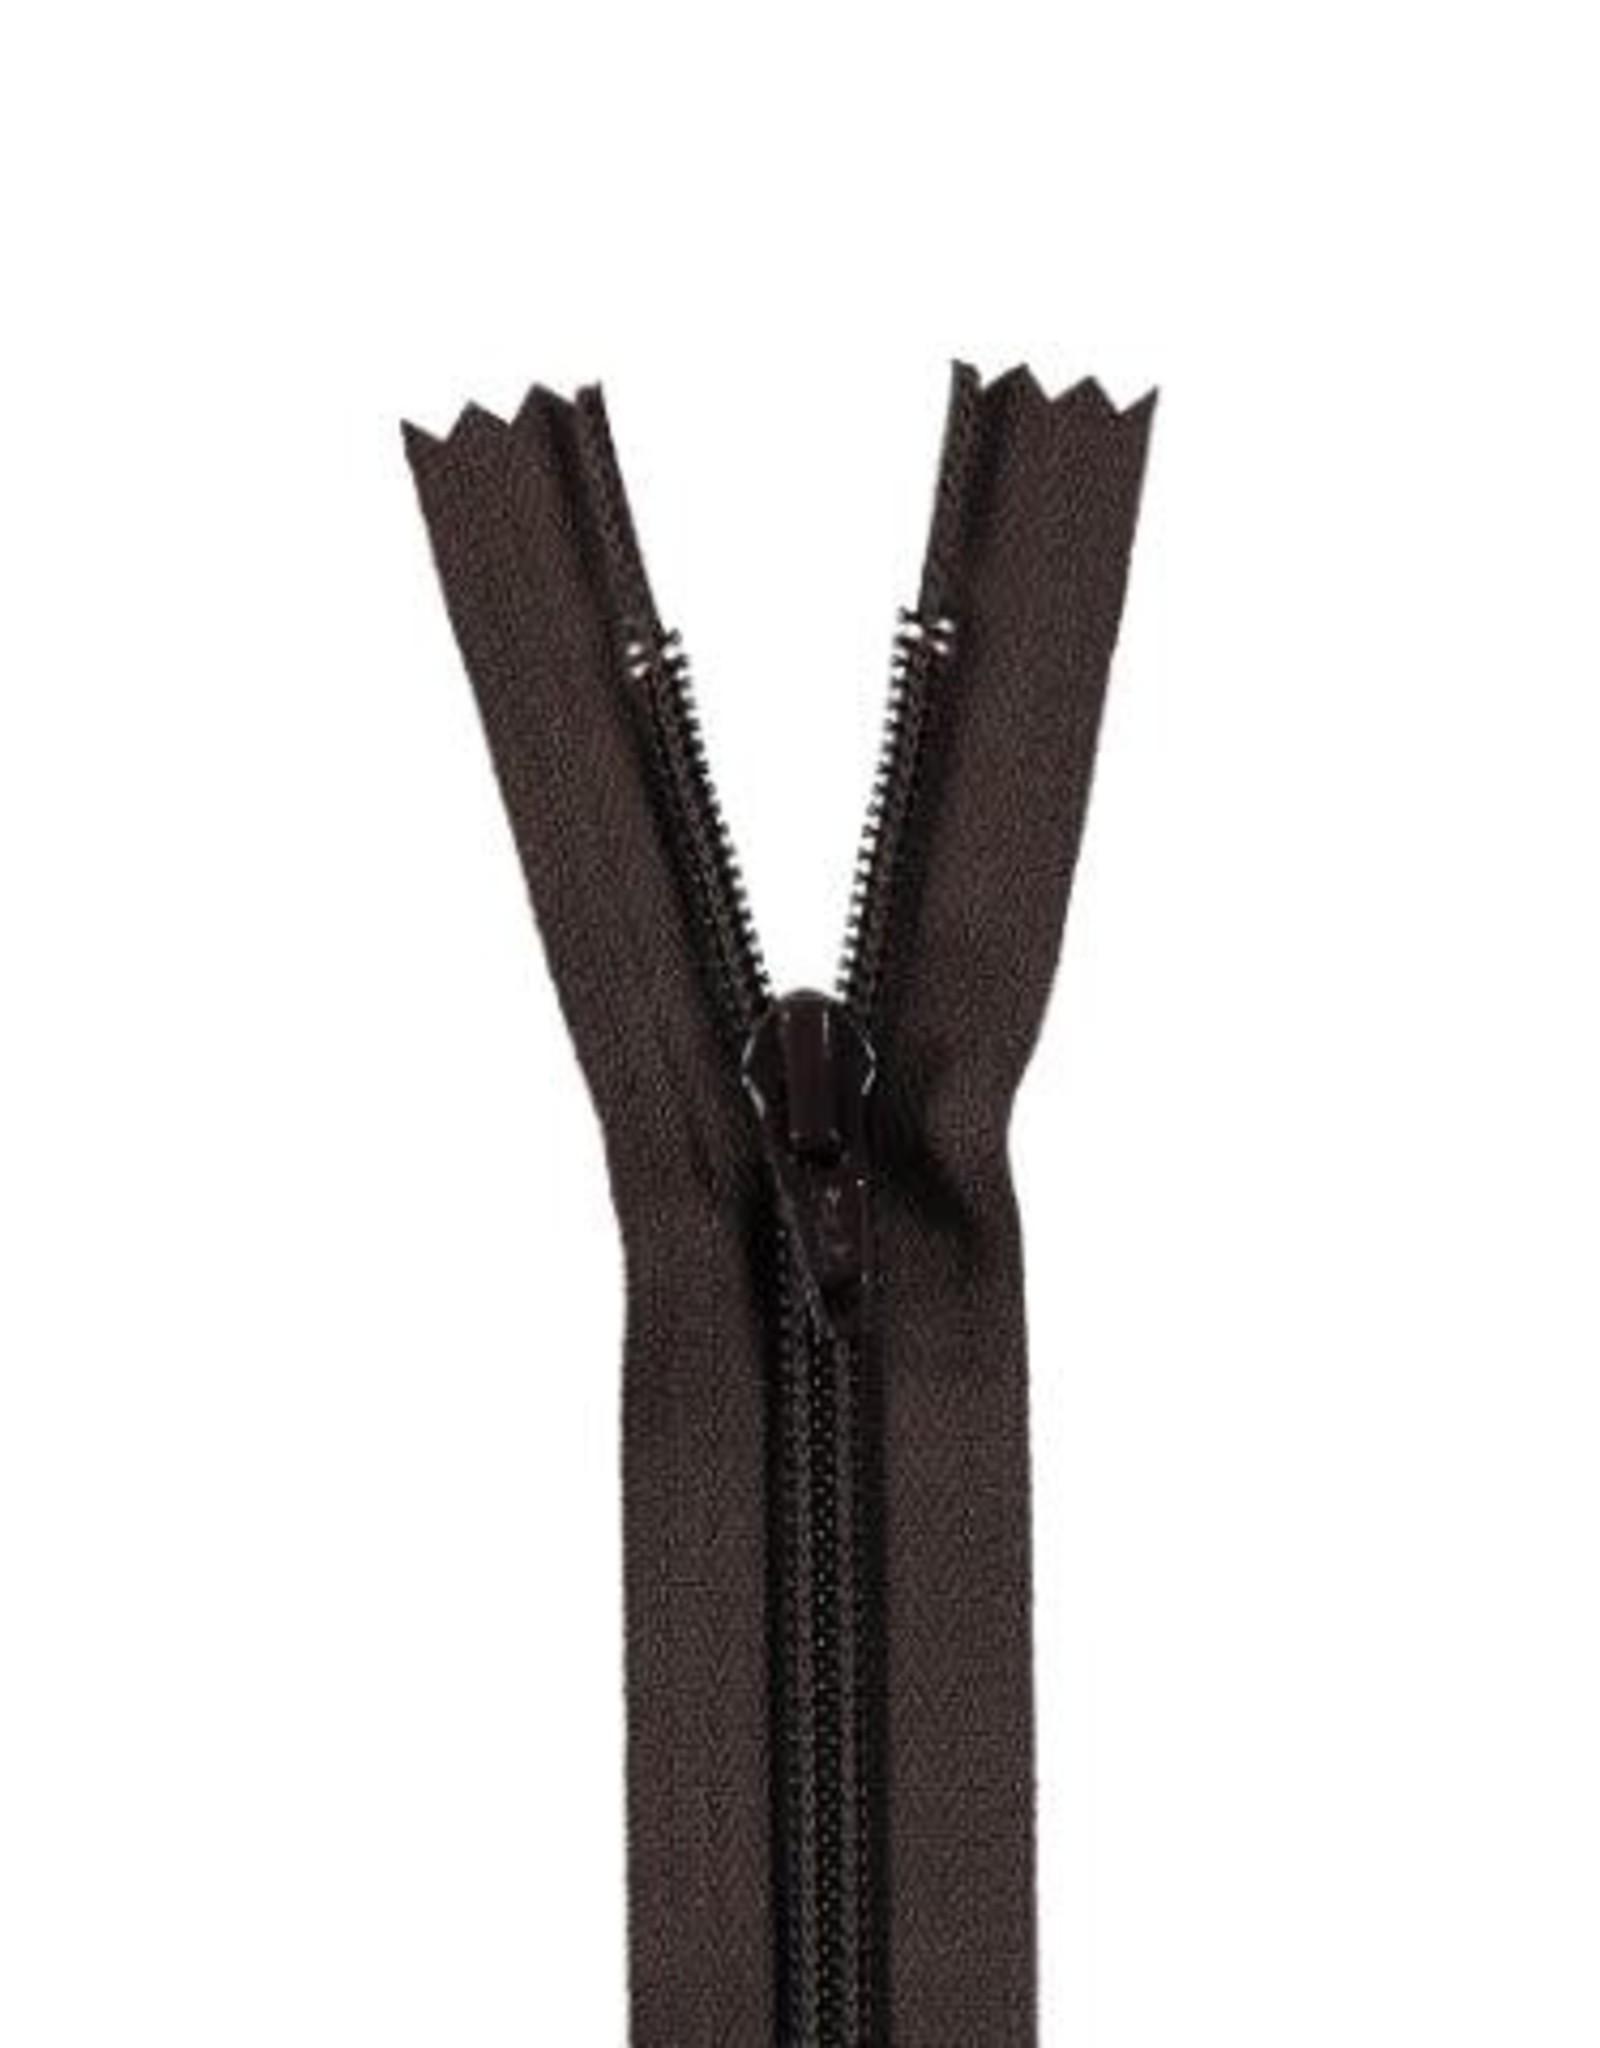 YKK Spiraalrits niet-DB 3mm donker bruin 570-25cm